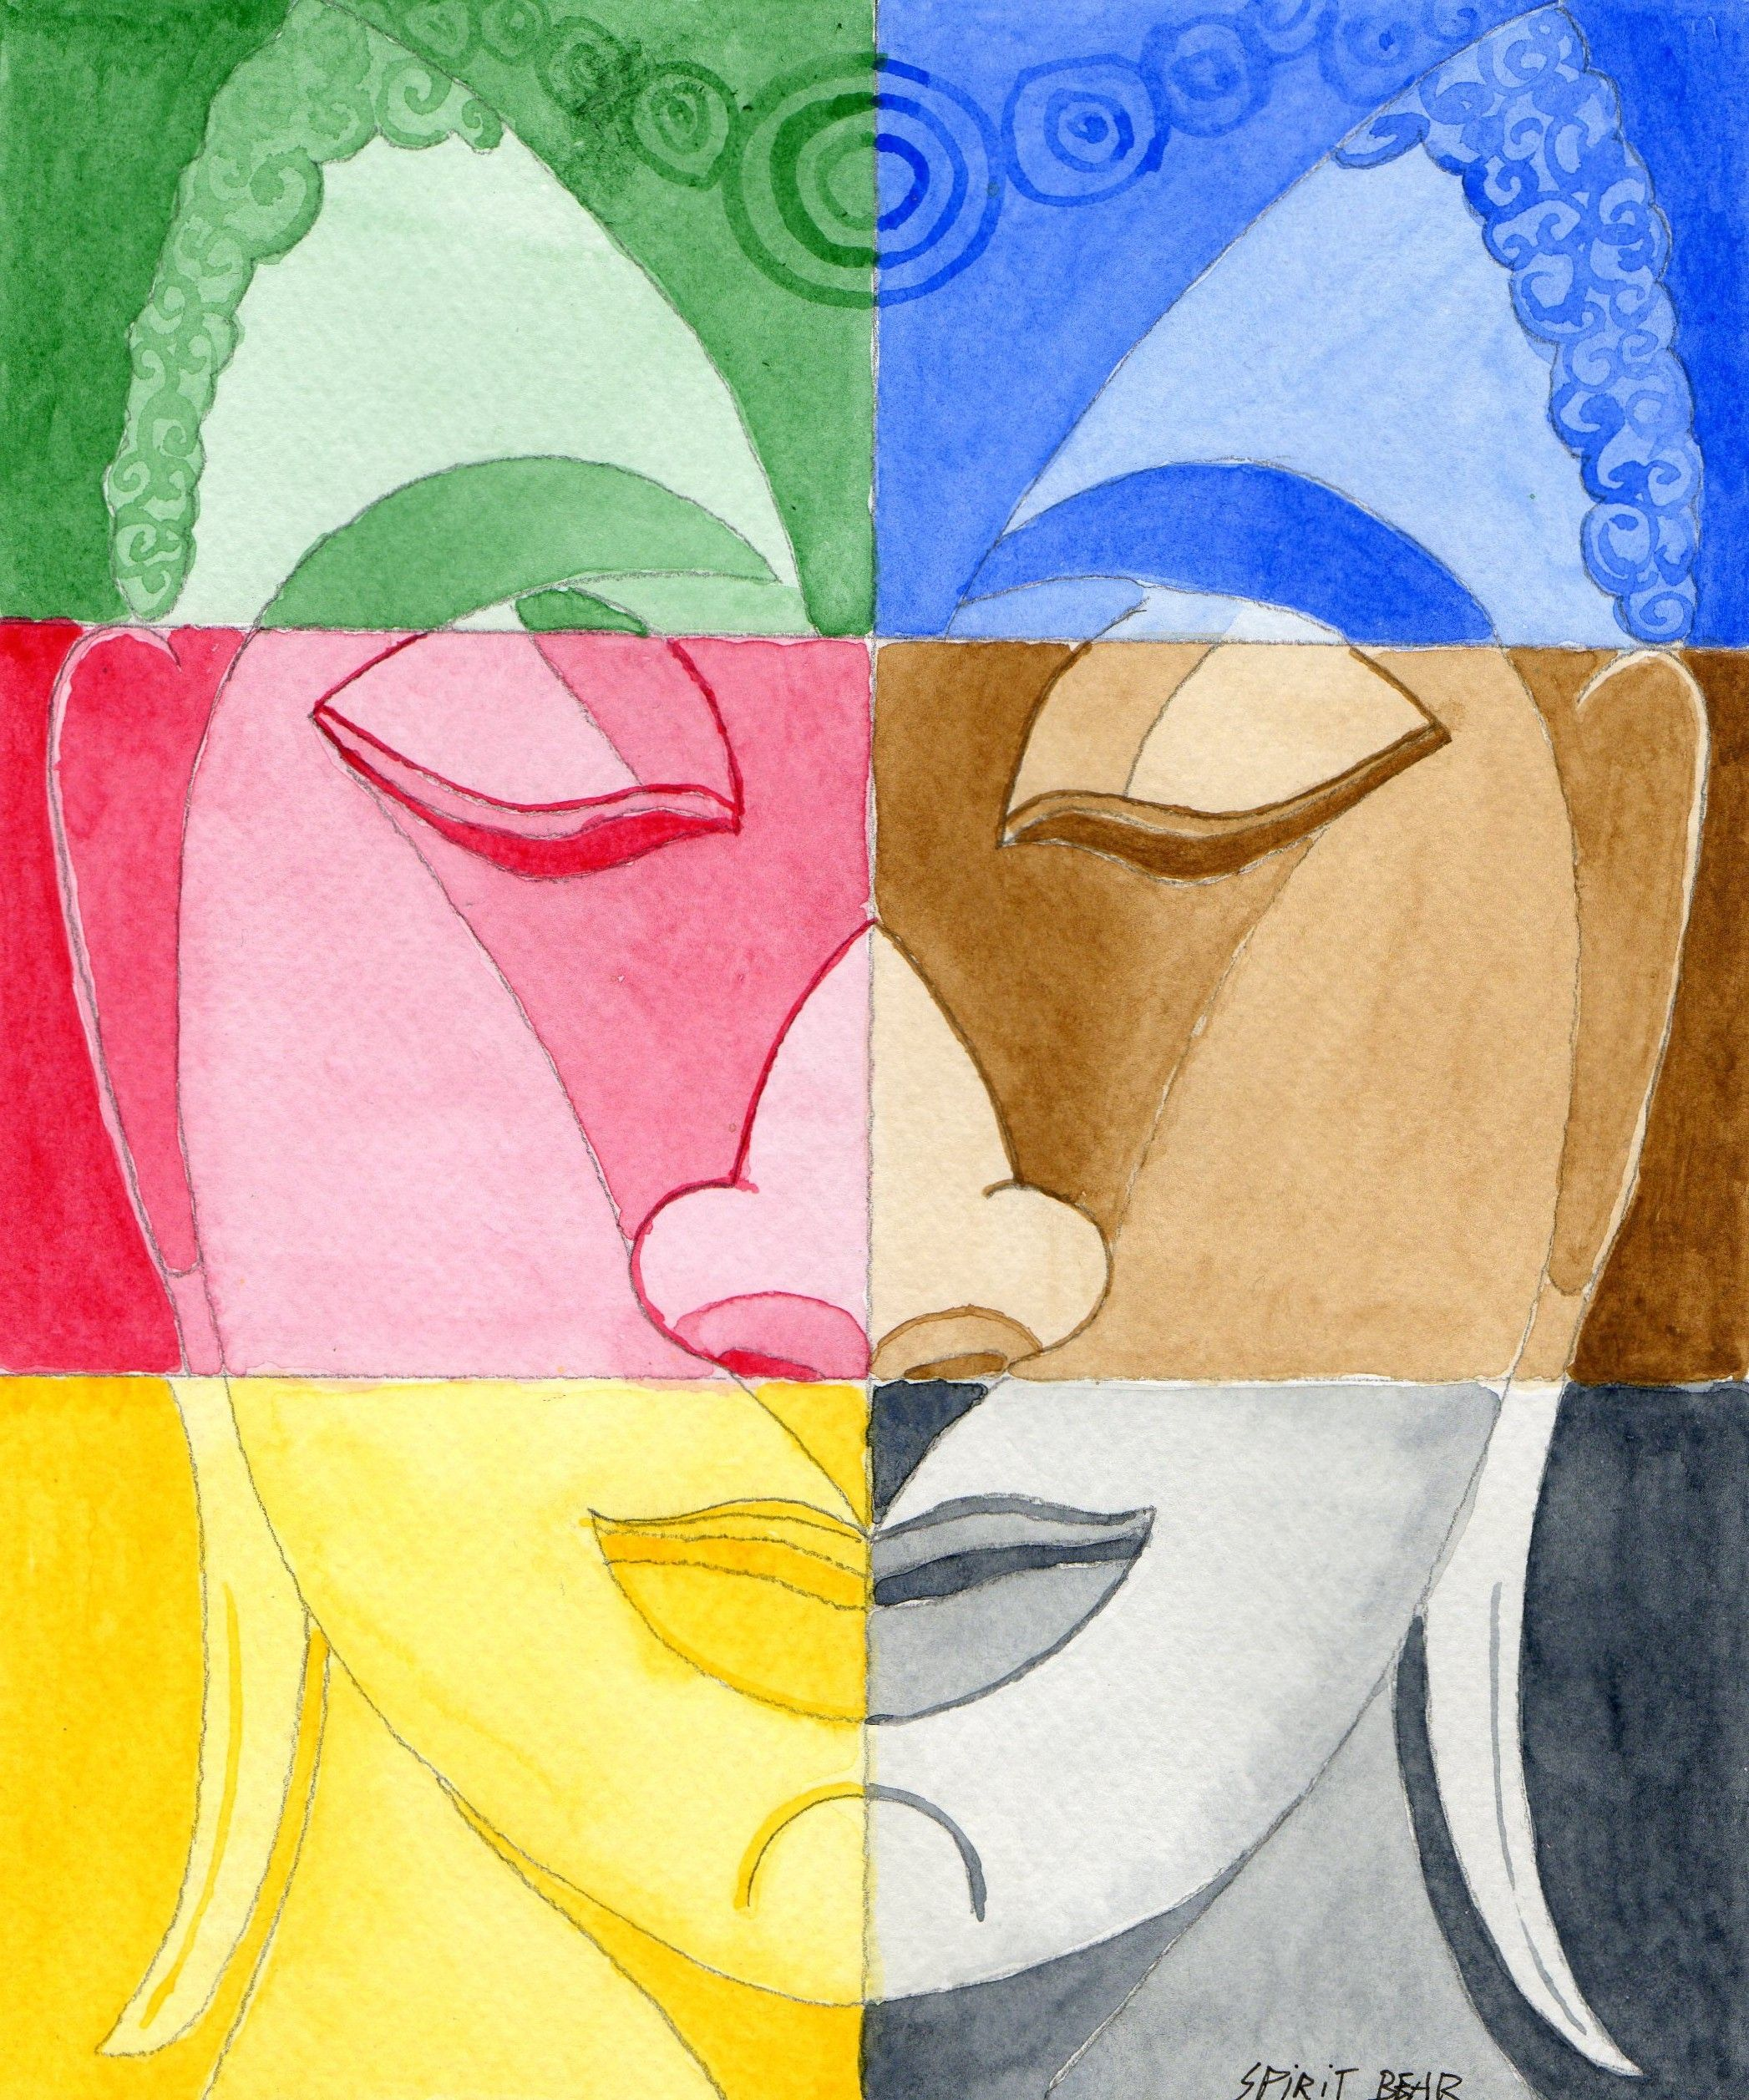 Buddha. Winsor & Newton Cotman on Canson paper.